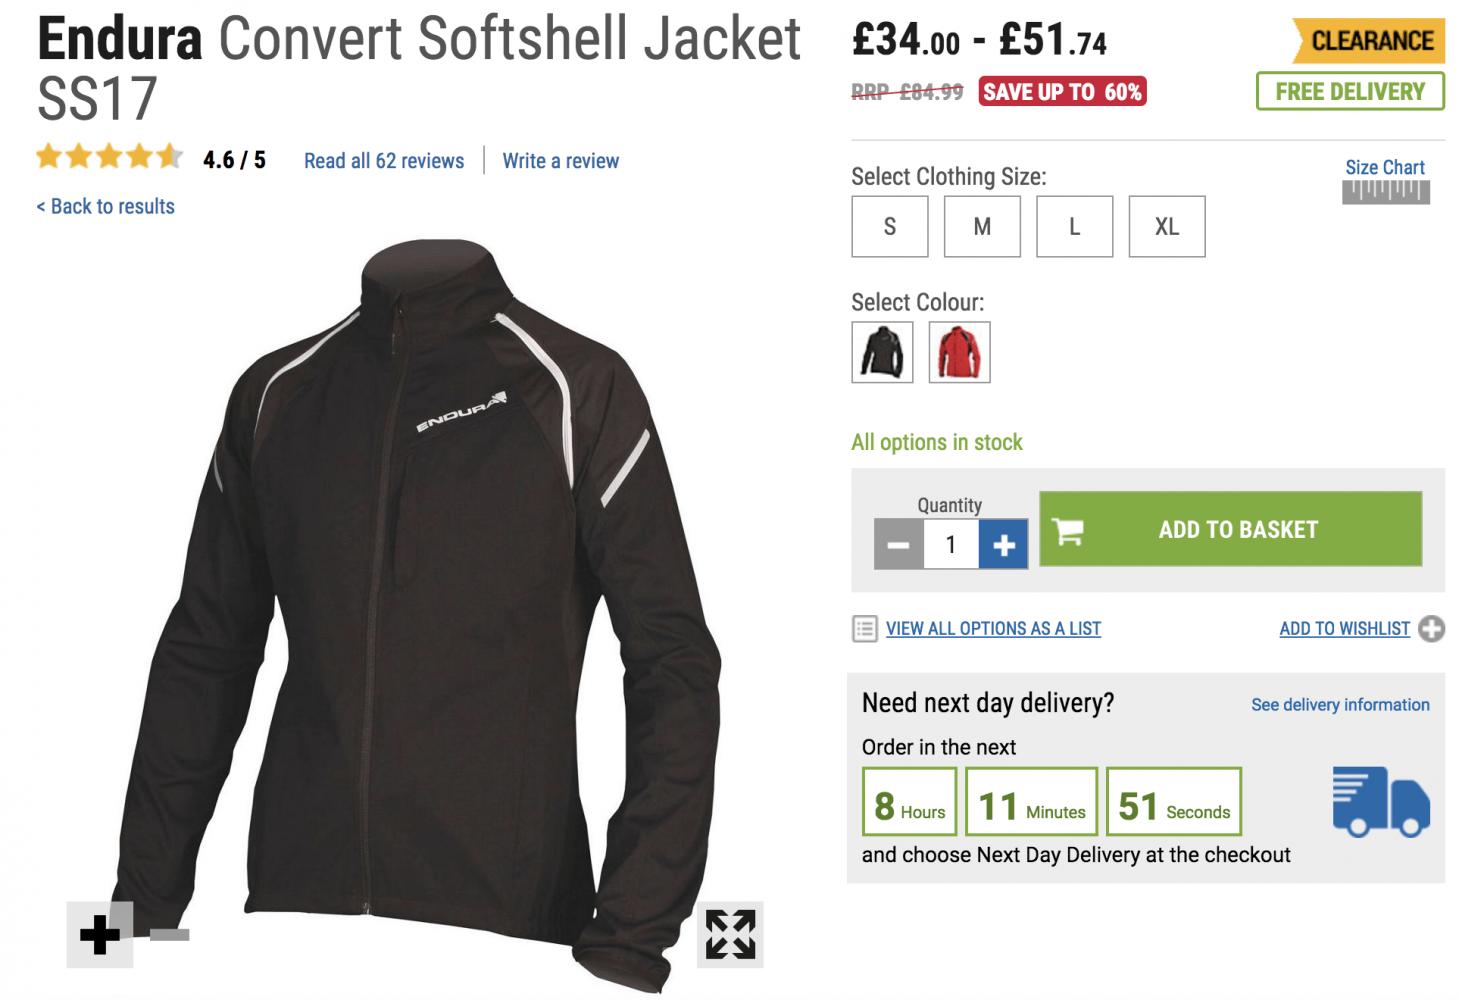 Endura Convert Softshell Jacket